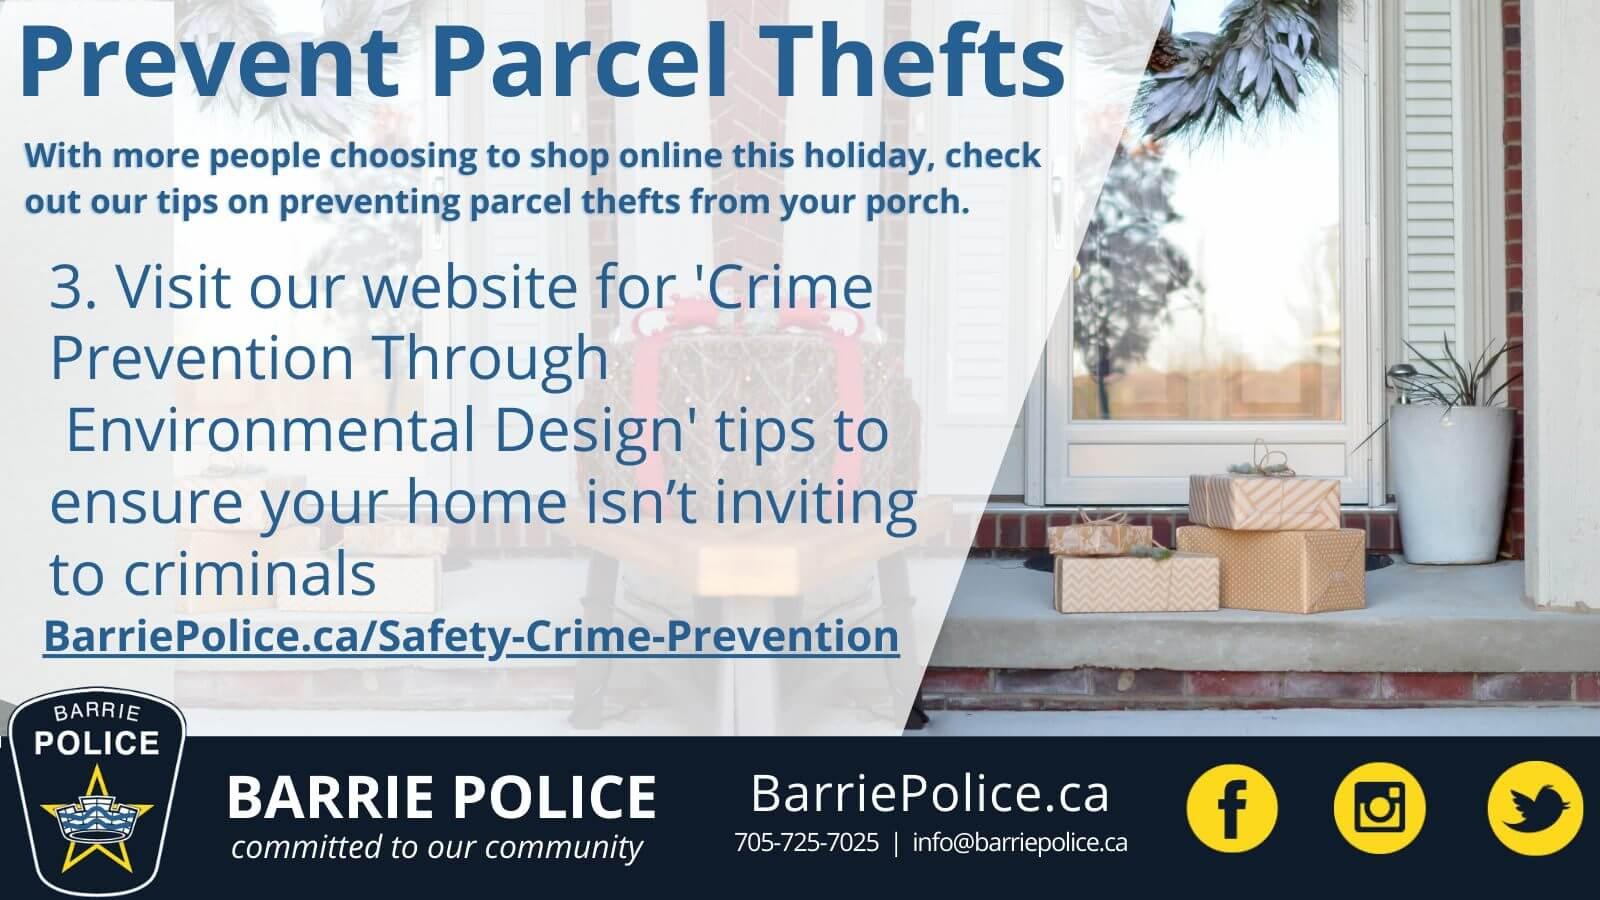 Prevent Parcel Thefts Tip 3: Crime Prevention Through Environmental Design tips on our website